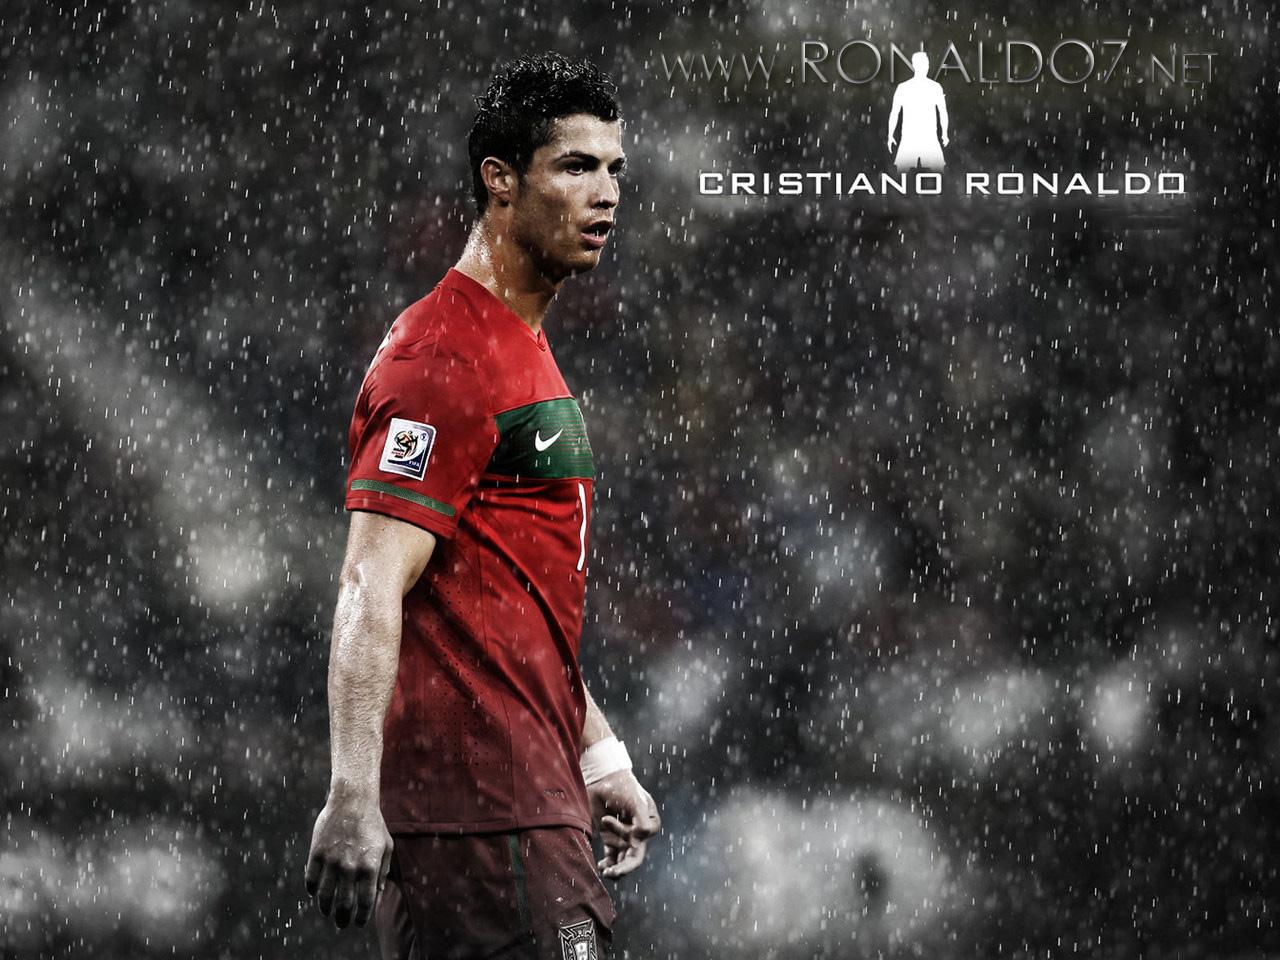 Cr7 Hd Wallpapers 1080p Ronaldo The Great Cristiano Ronaldo Fan Art 35390401